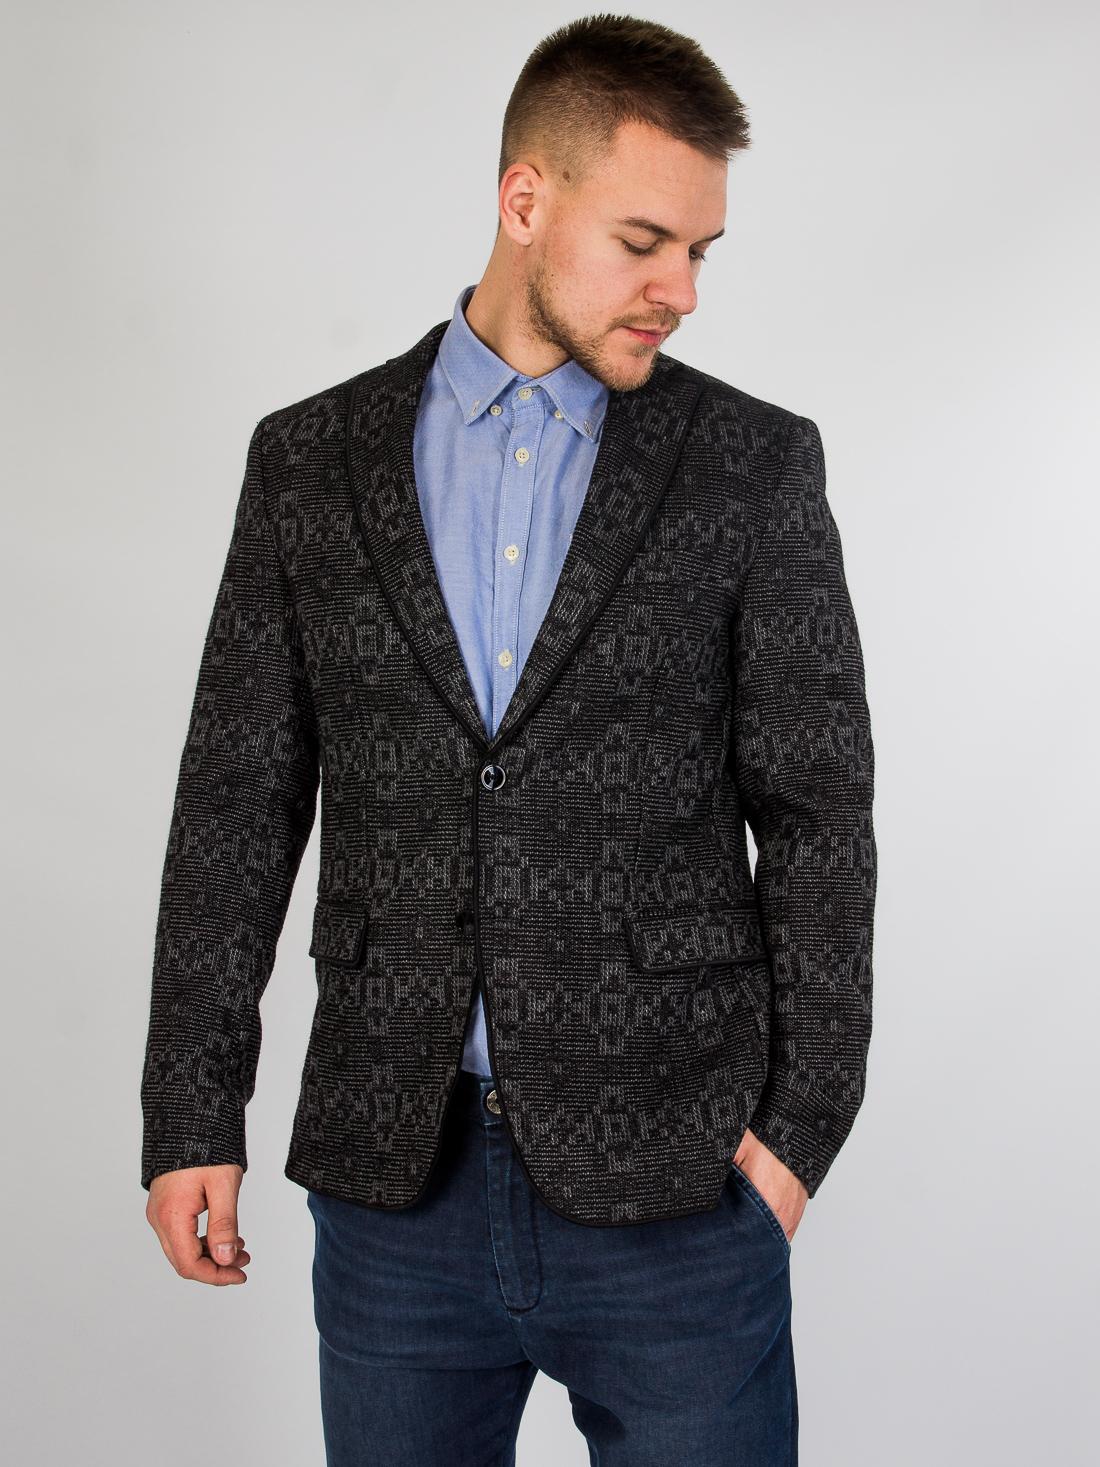 Шерстяной пиджак Zara Серый Free Style